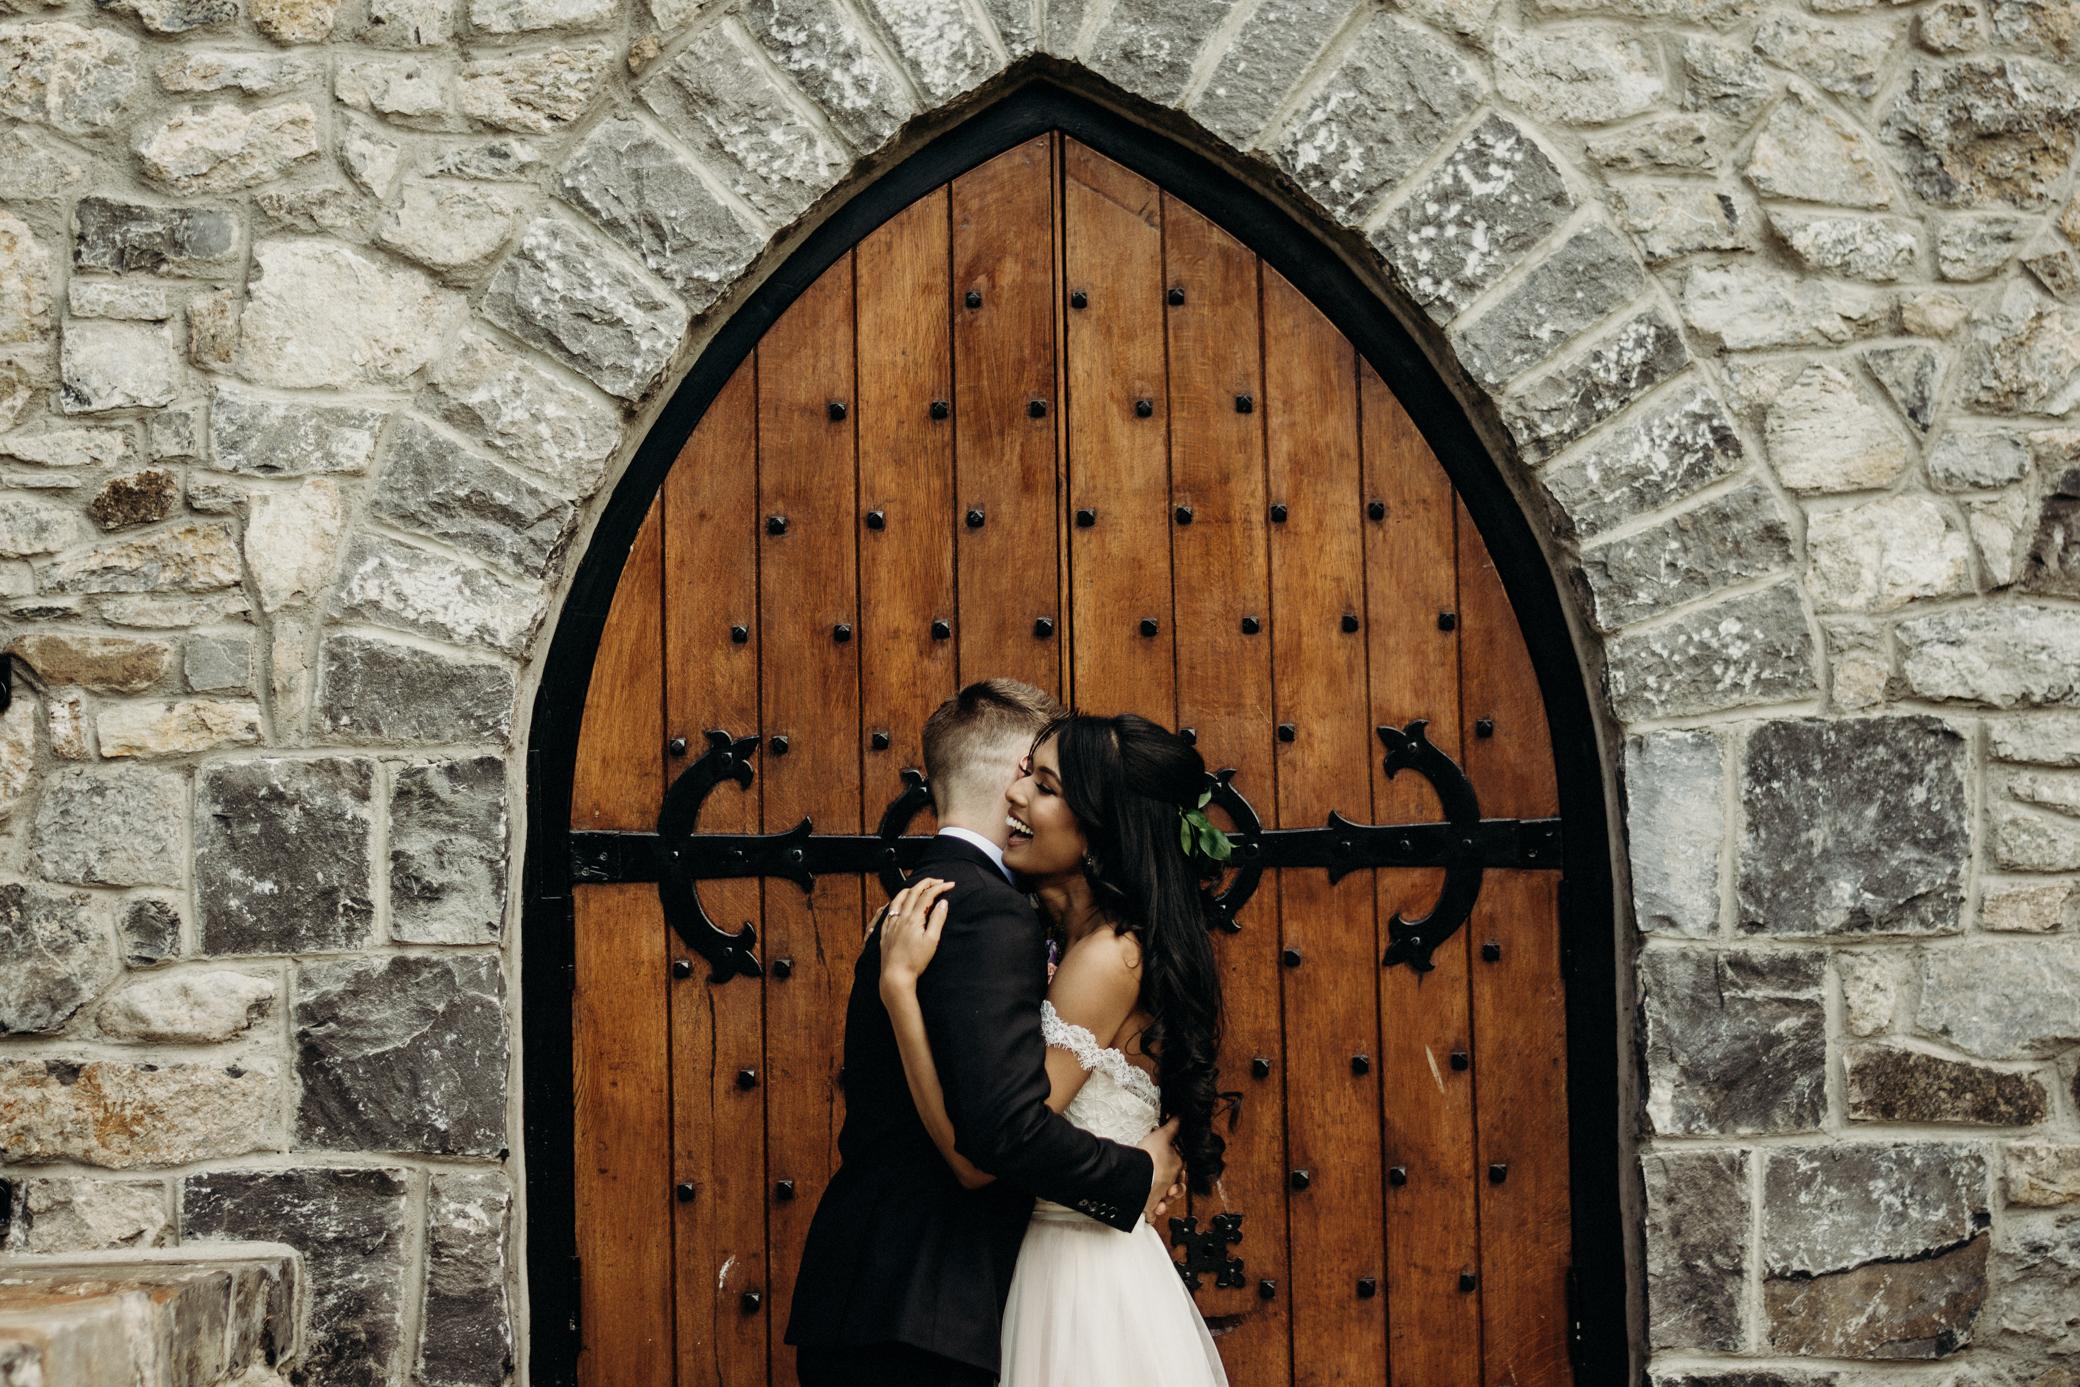 Alan&Naz- Barberstown Castle Wedding - Wedding photographer Ireland-147.jpg